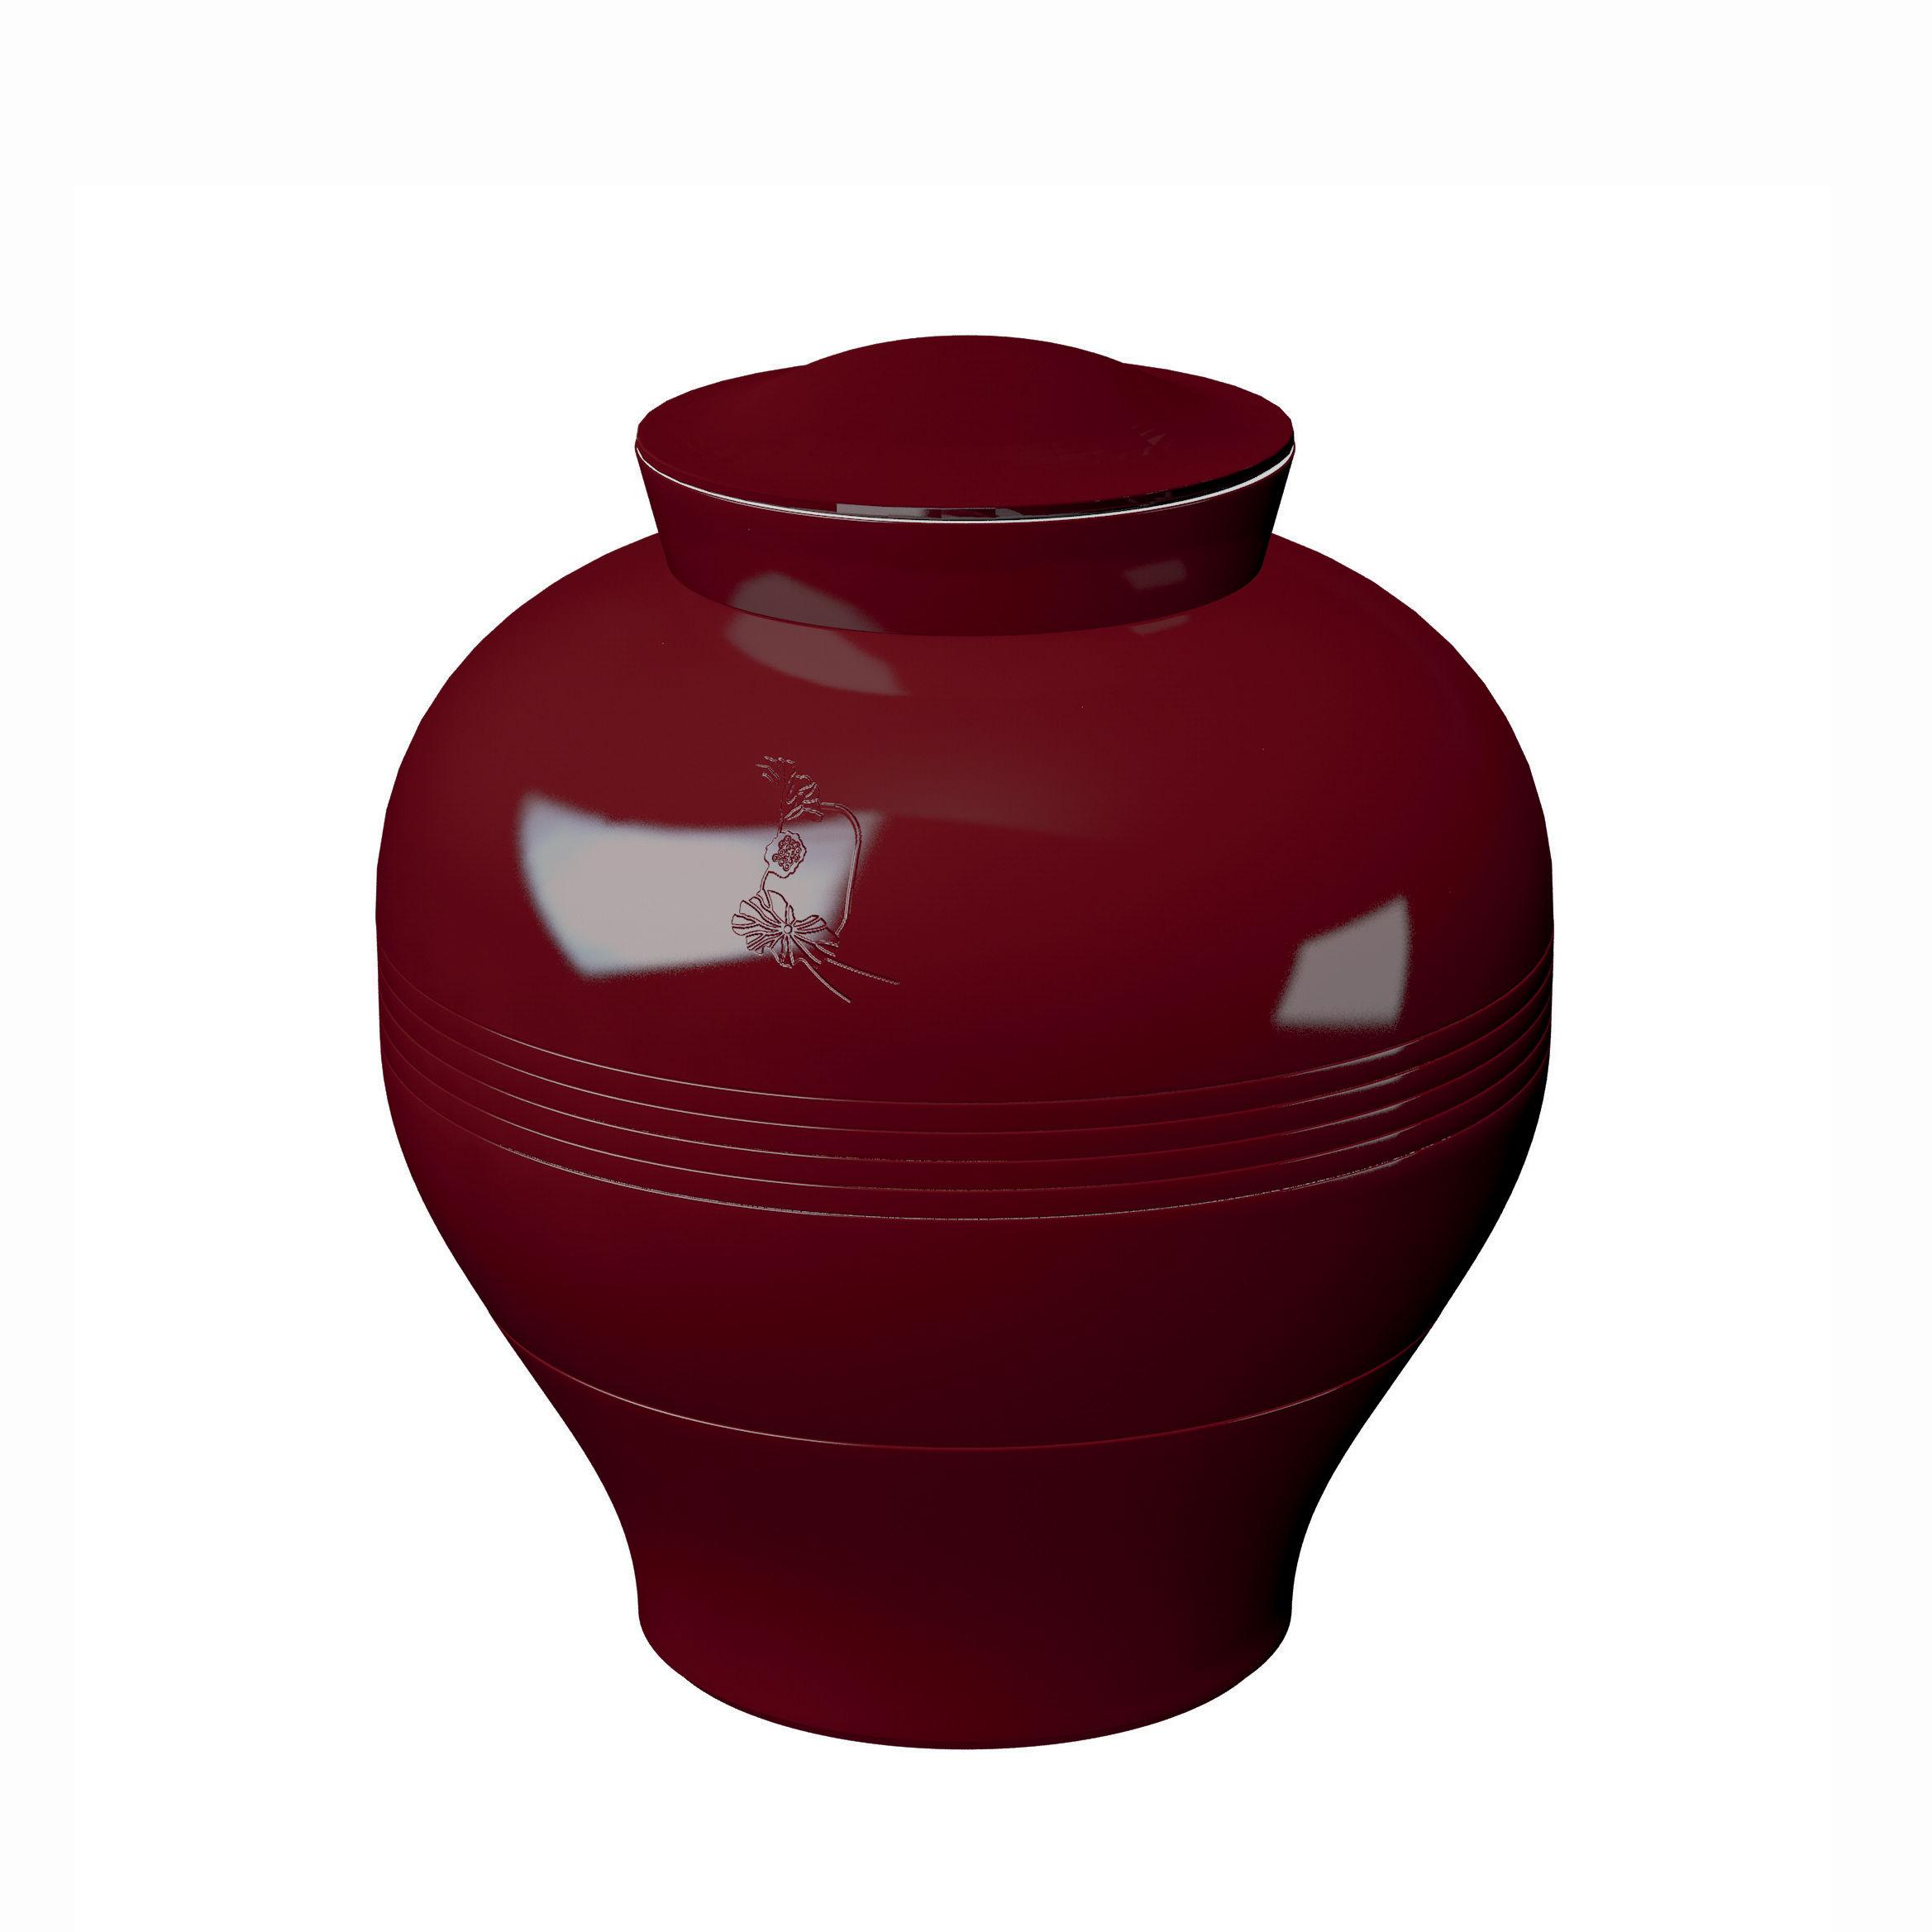 Tableware - Plates - Yuan Eden Dinner service - / 8 stackable parts by Ibride - Purple/ Multicoloured motifs (Eden) - Melamine